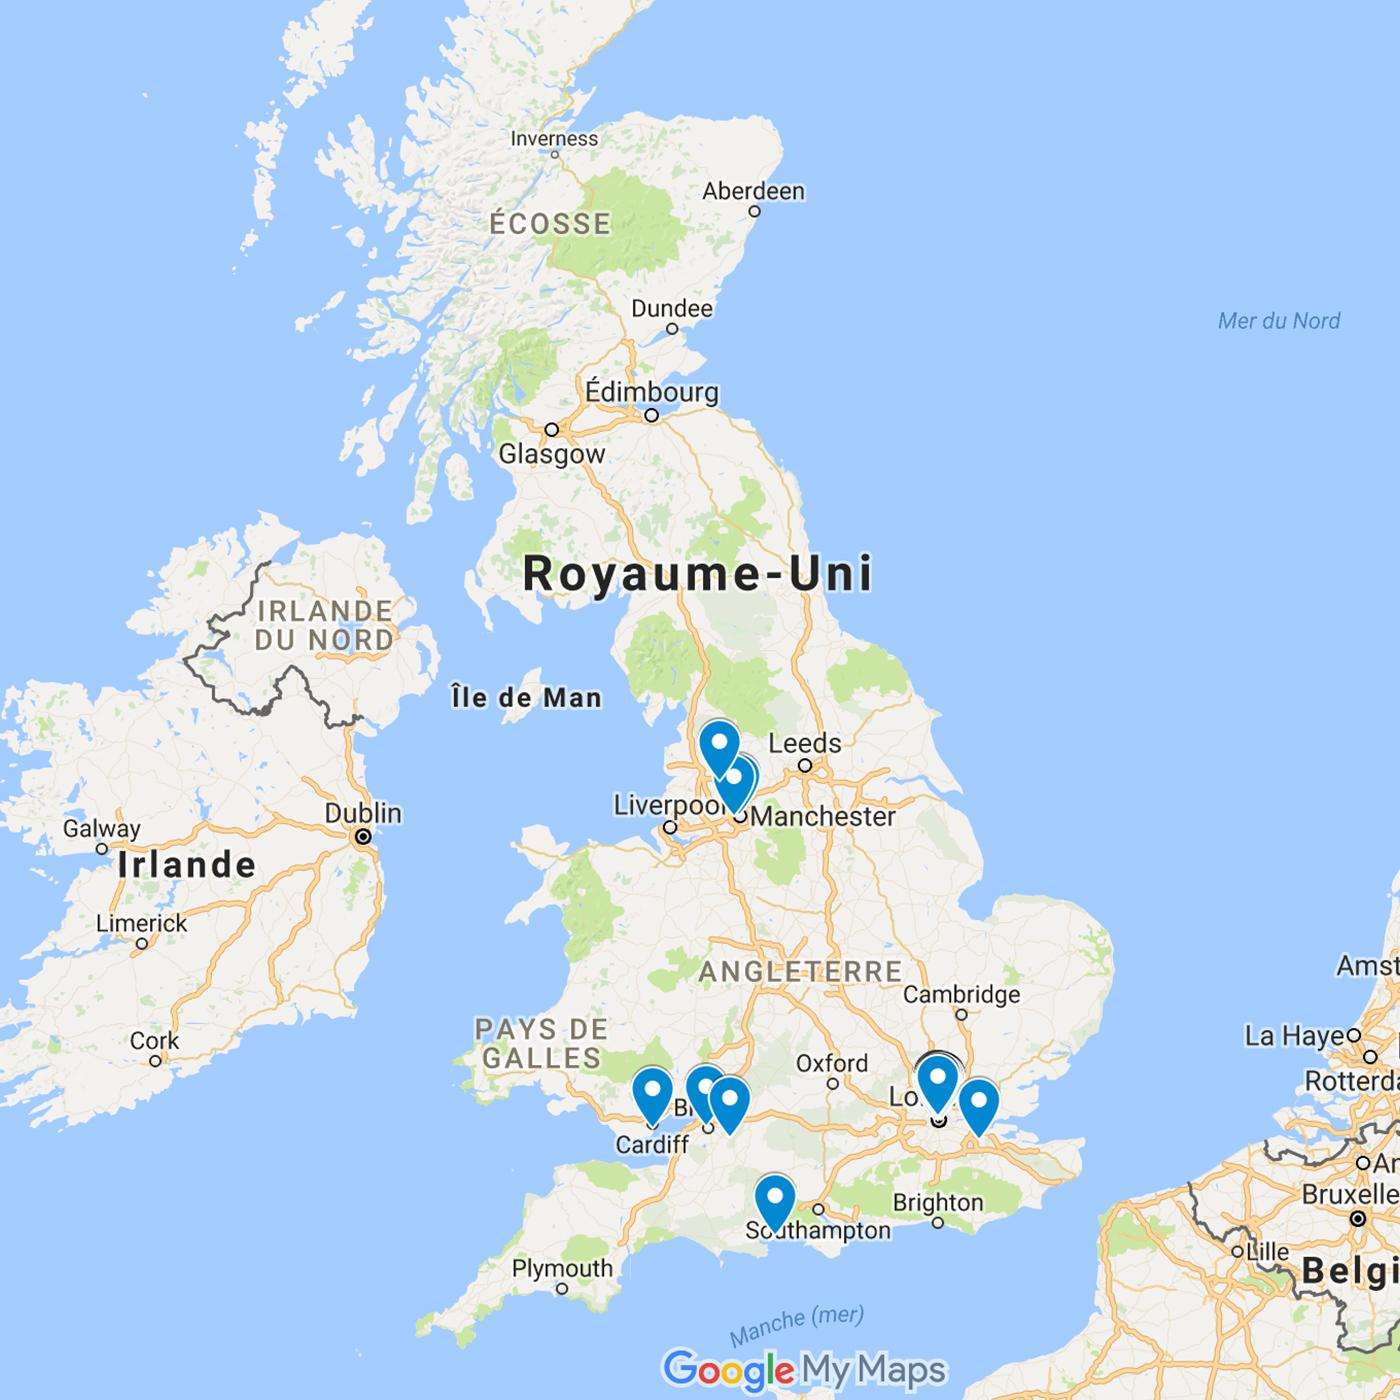 the-london-ad-agencies-map-3